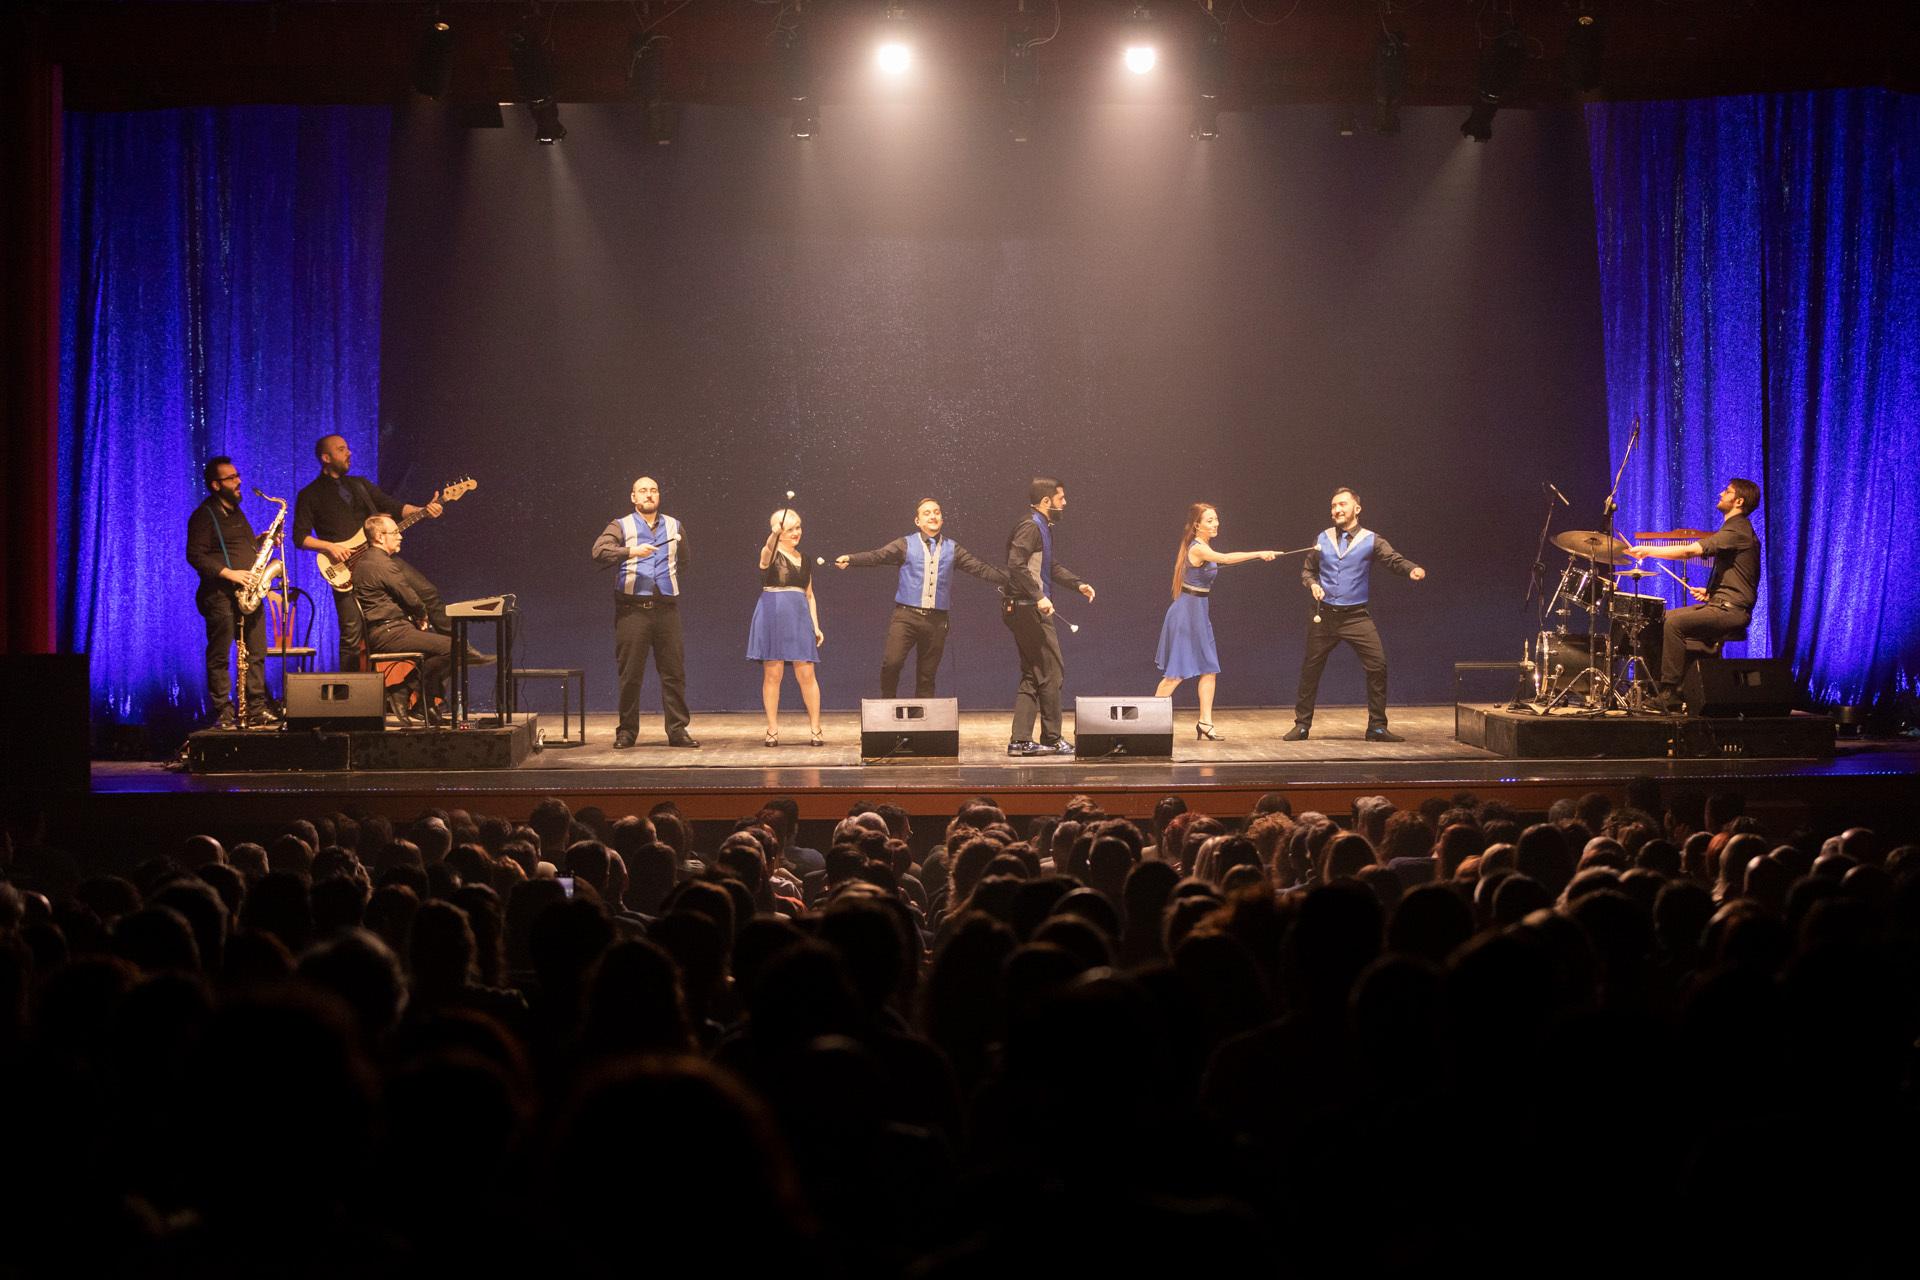 2019_03_12-Blue-Il-Musical-©-Luca-Vantusso-210258-EOSR3903